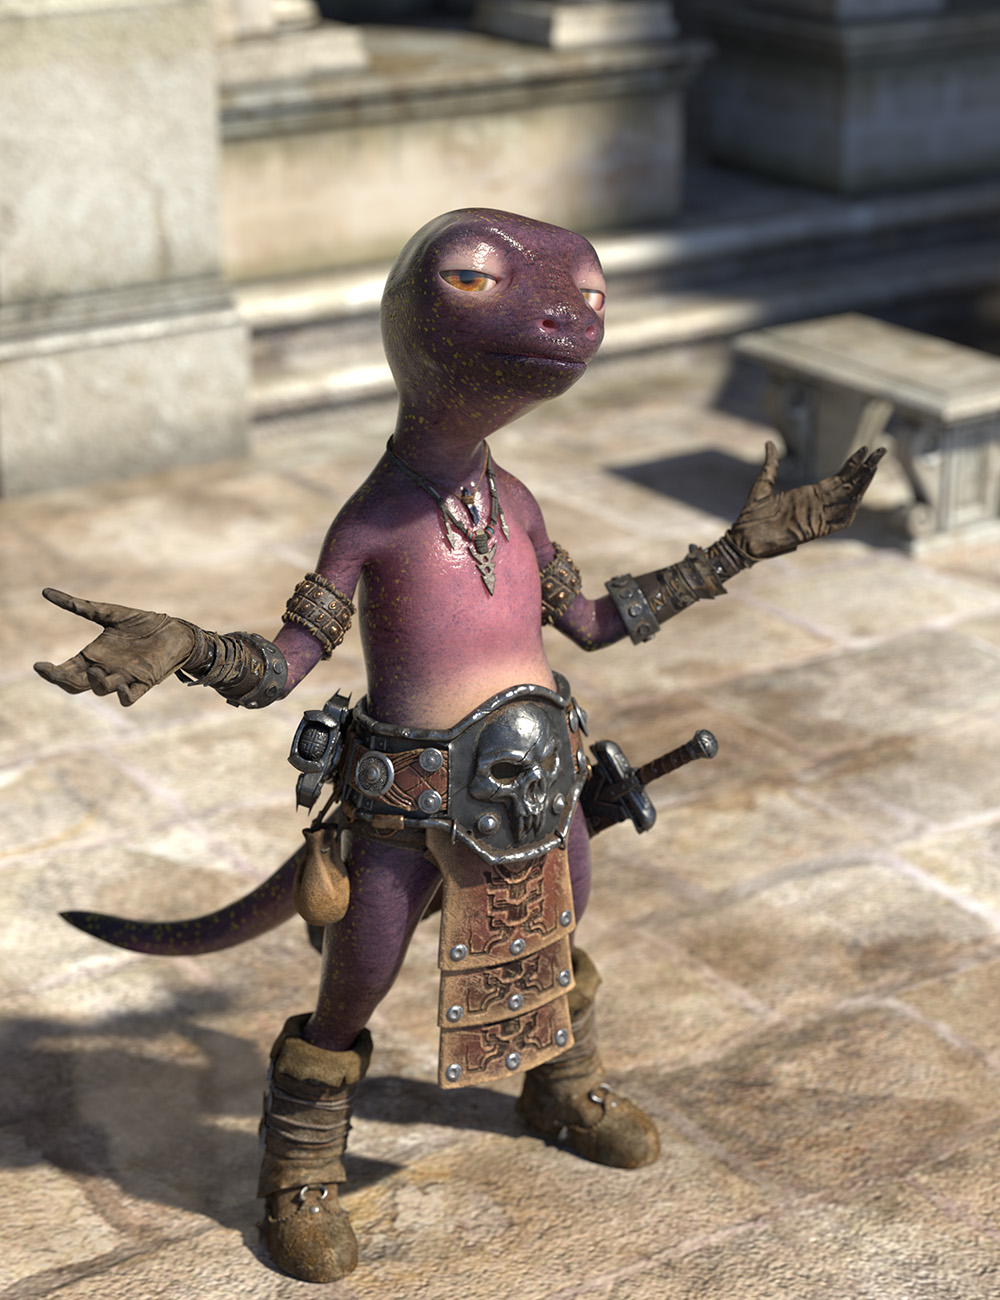 Oso Newt for Genesis 8.1 Male by: Oso3D, 3D Models by Daz 3D